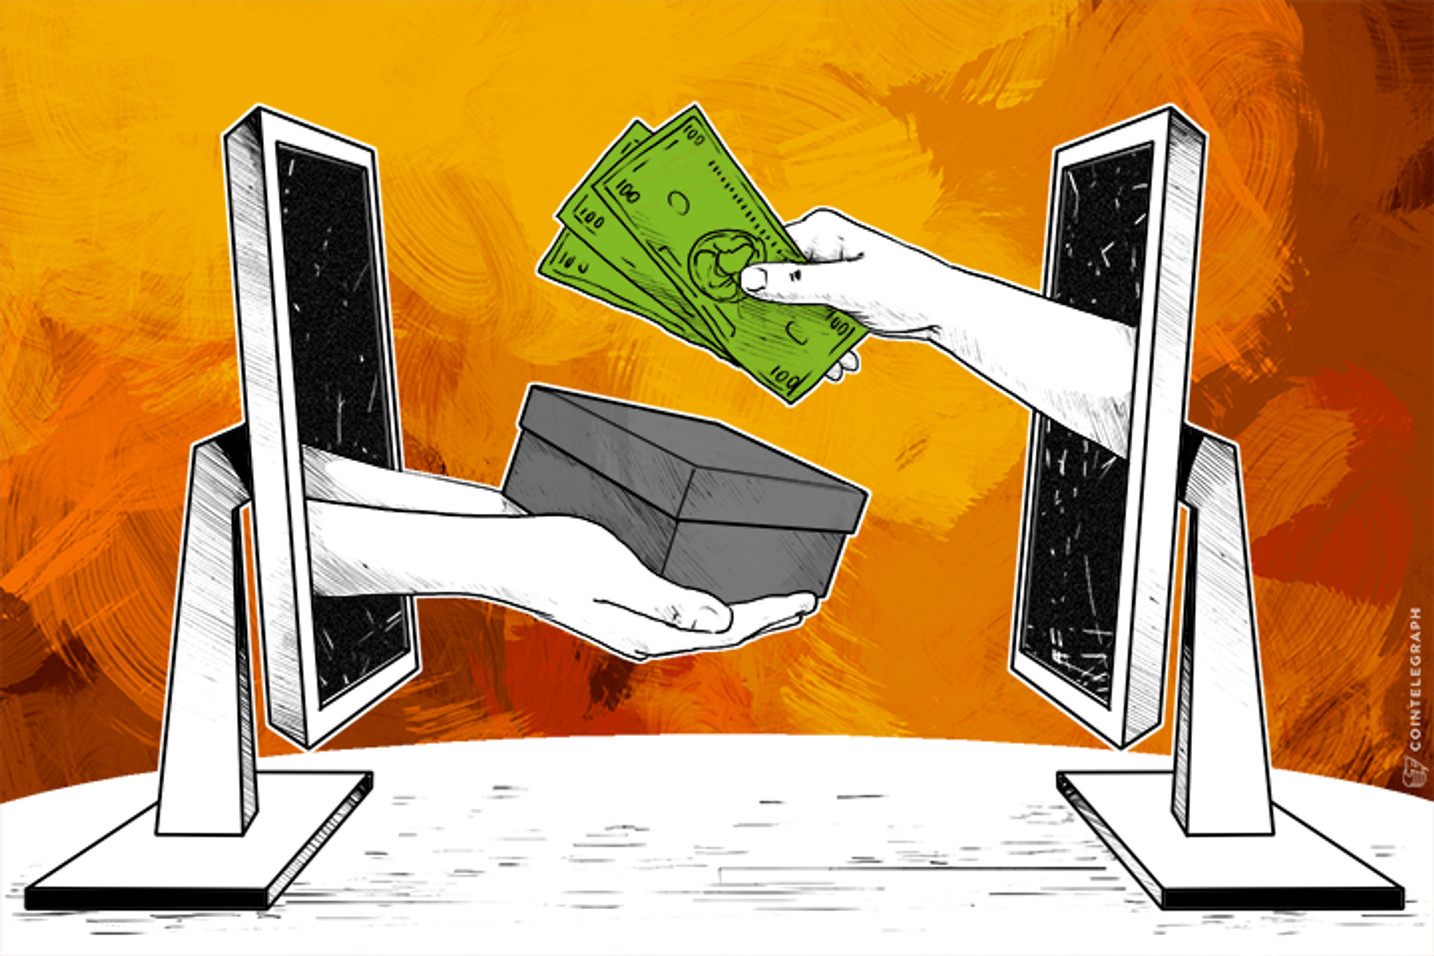 Proposal for Local Dark Market Build on Bitcoin Blockchain Circulates on Satoshi's Mailing List